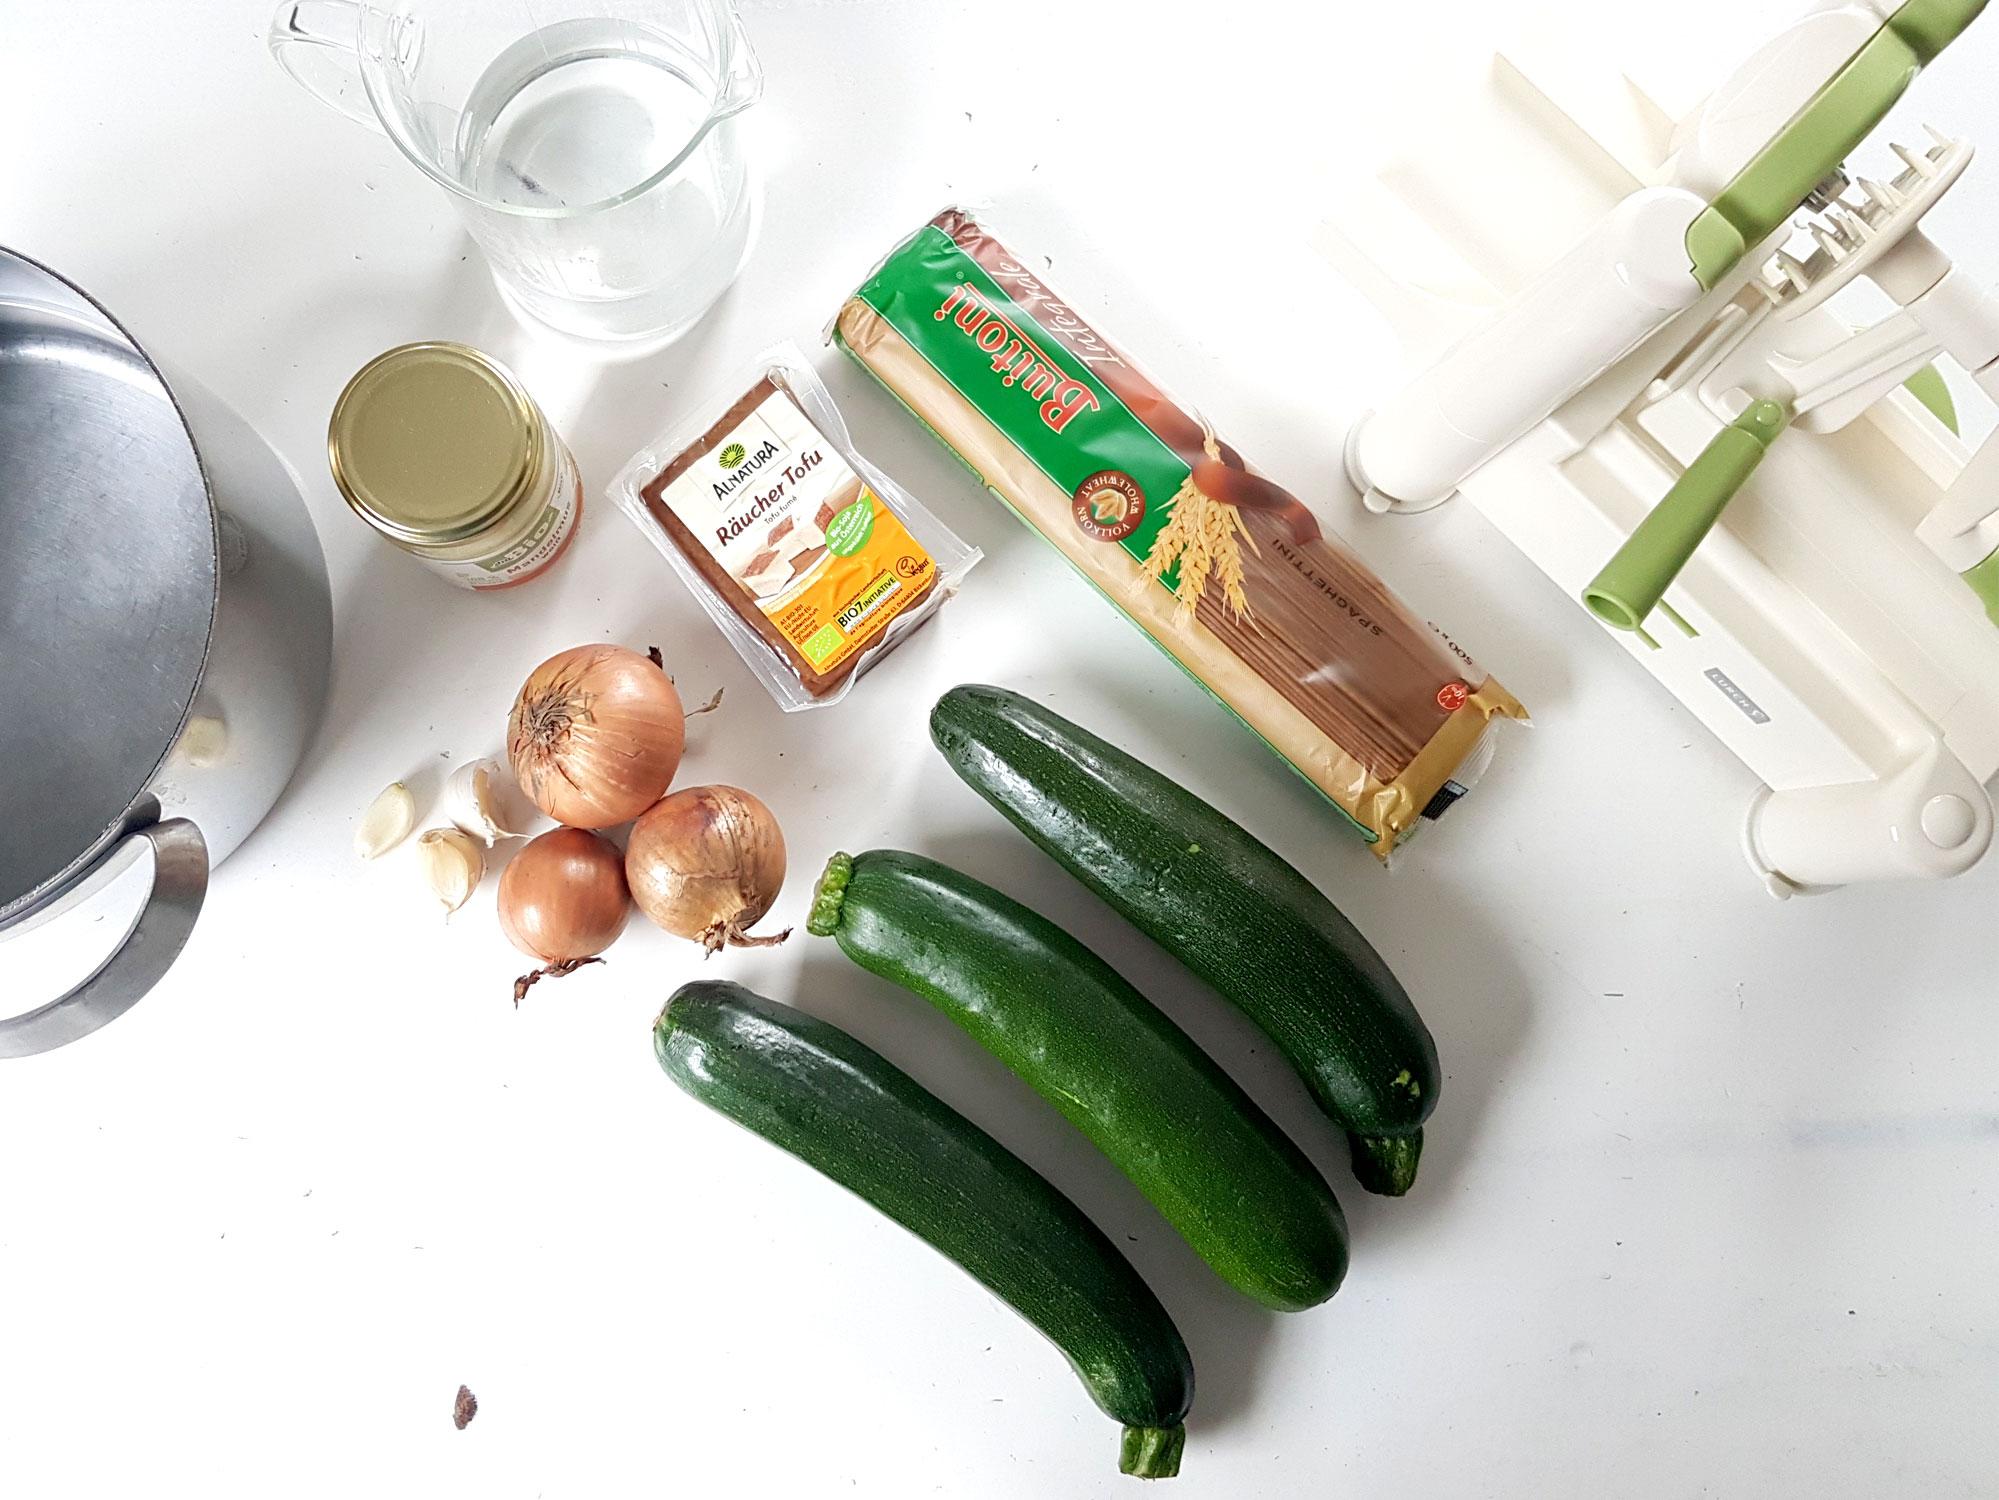 Zucchinispaghetti mit Räuchertofusoße-7